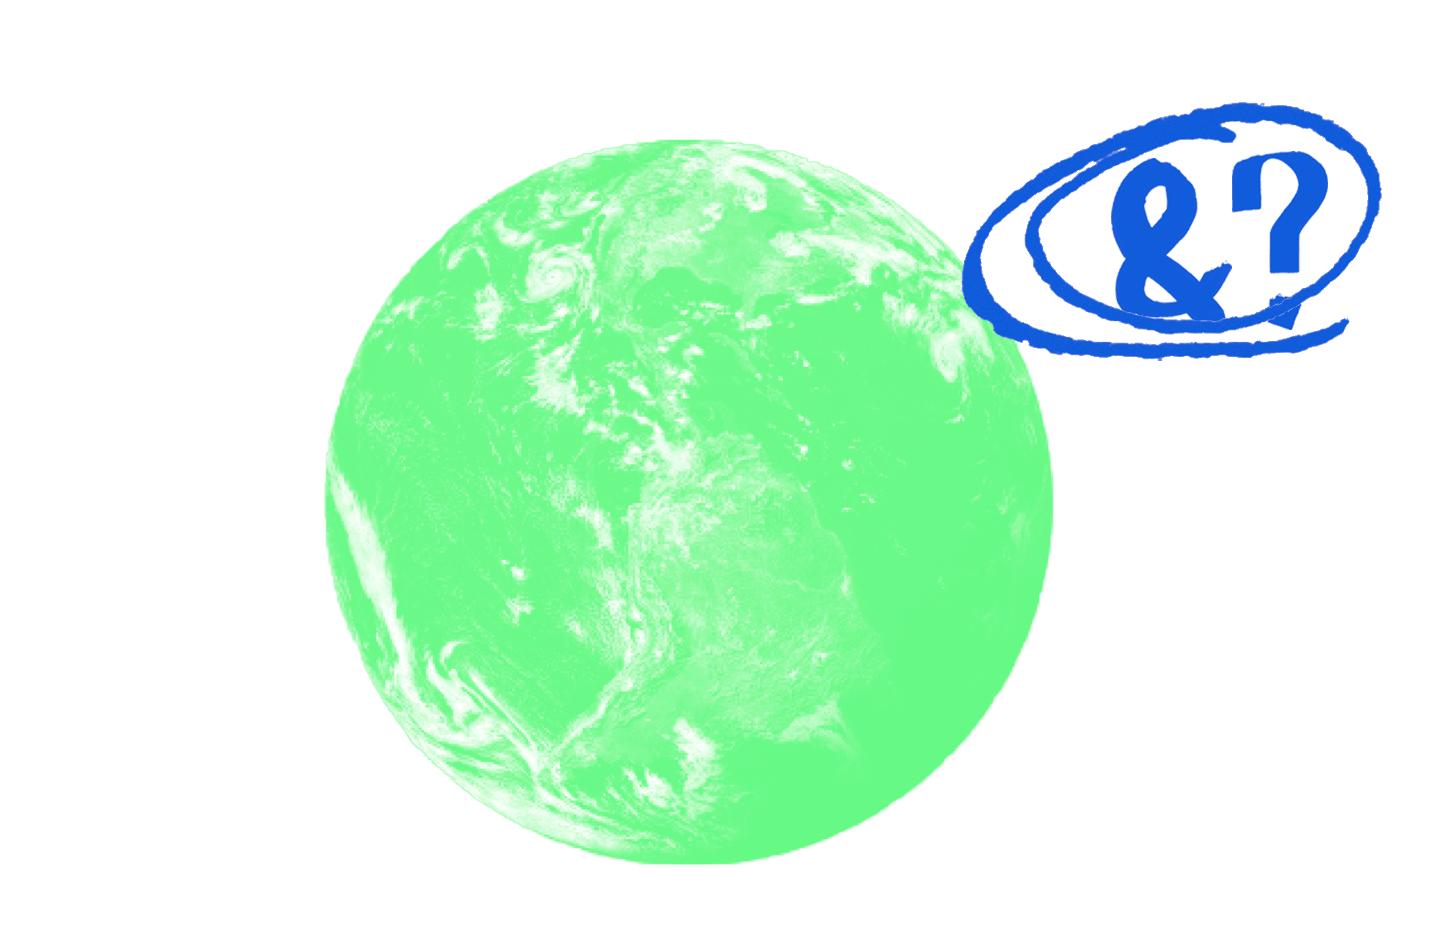 And the Future? logo